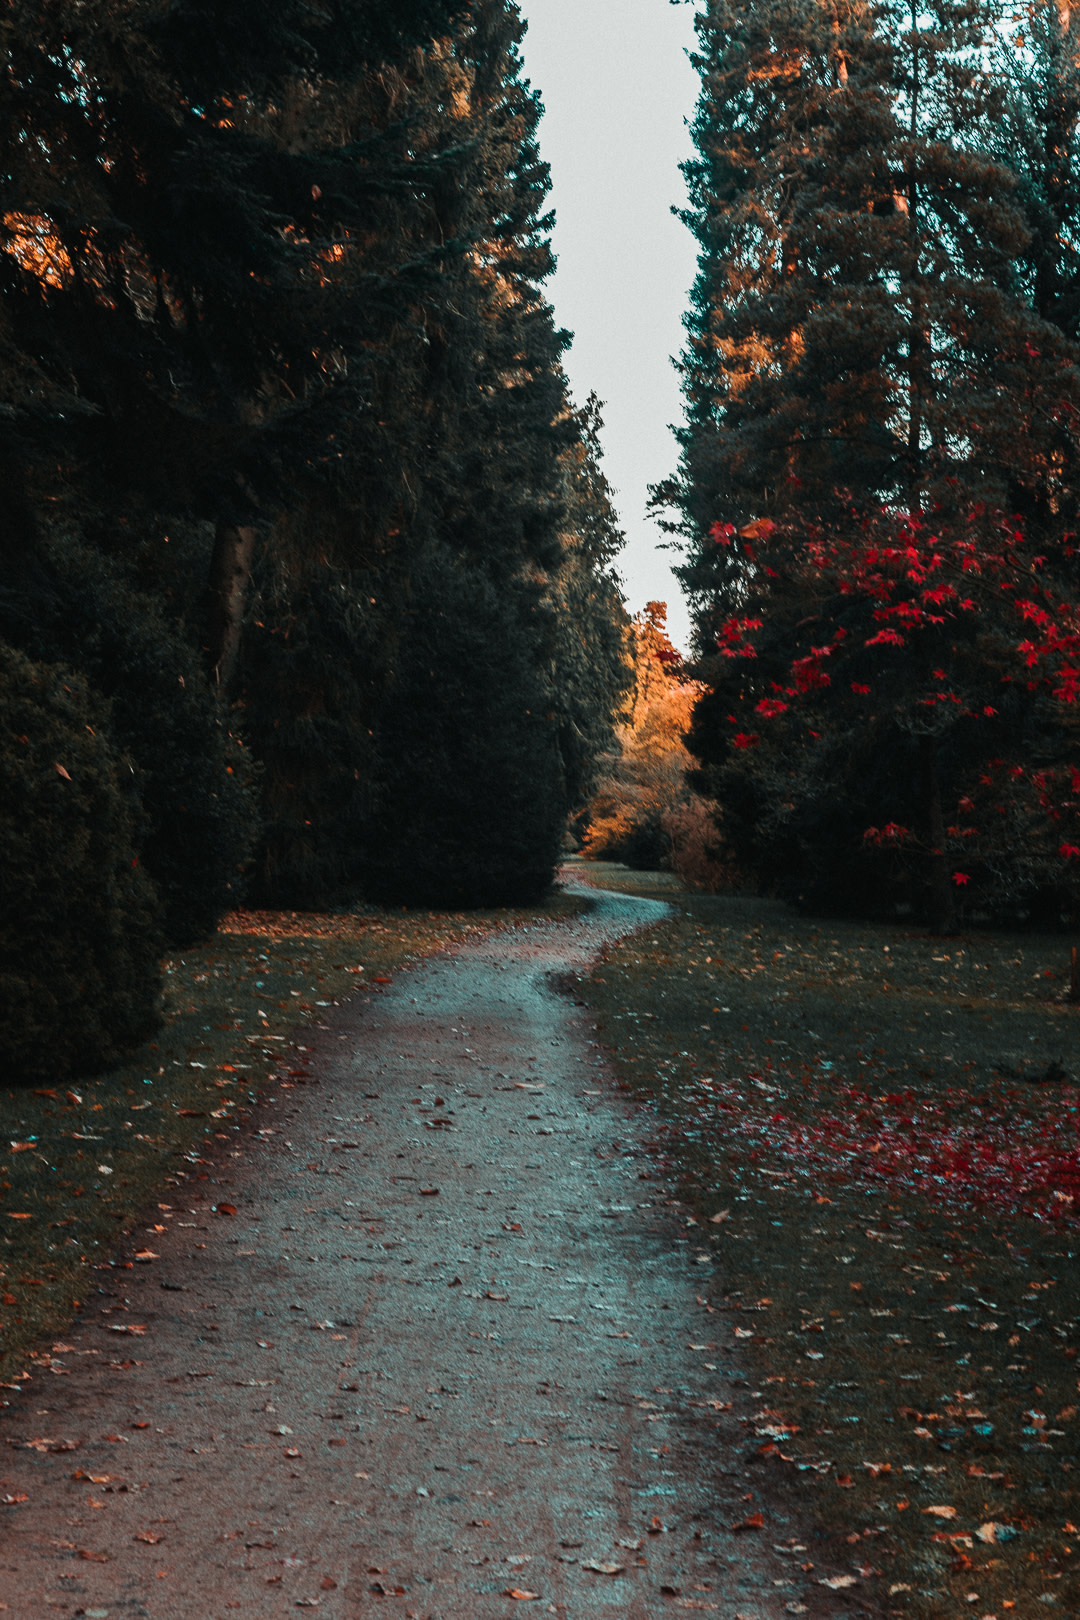 One of the Beautiful Seasonal Trails